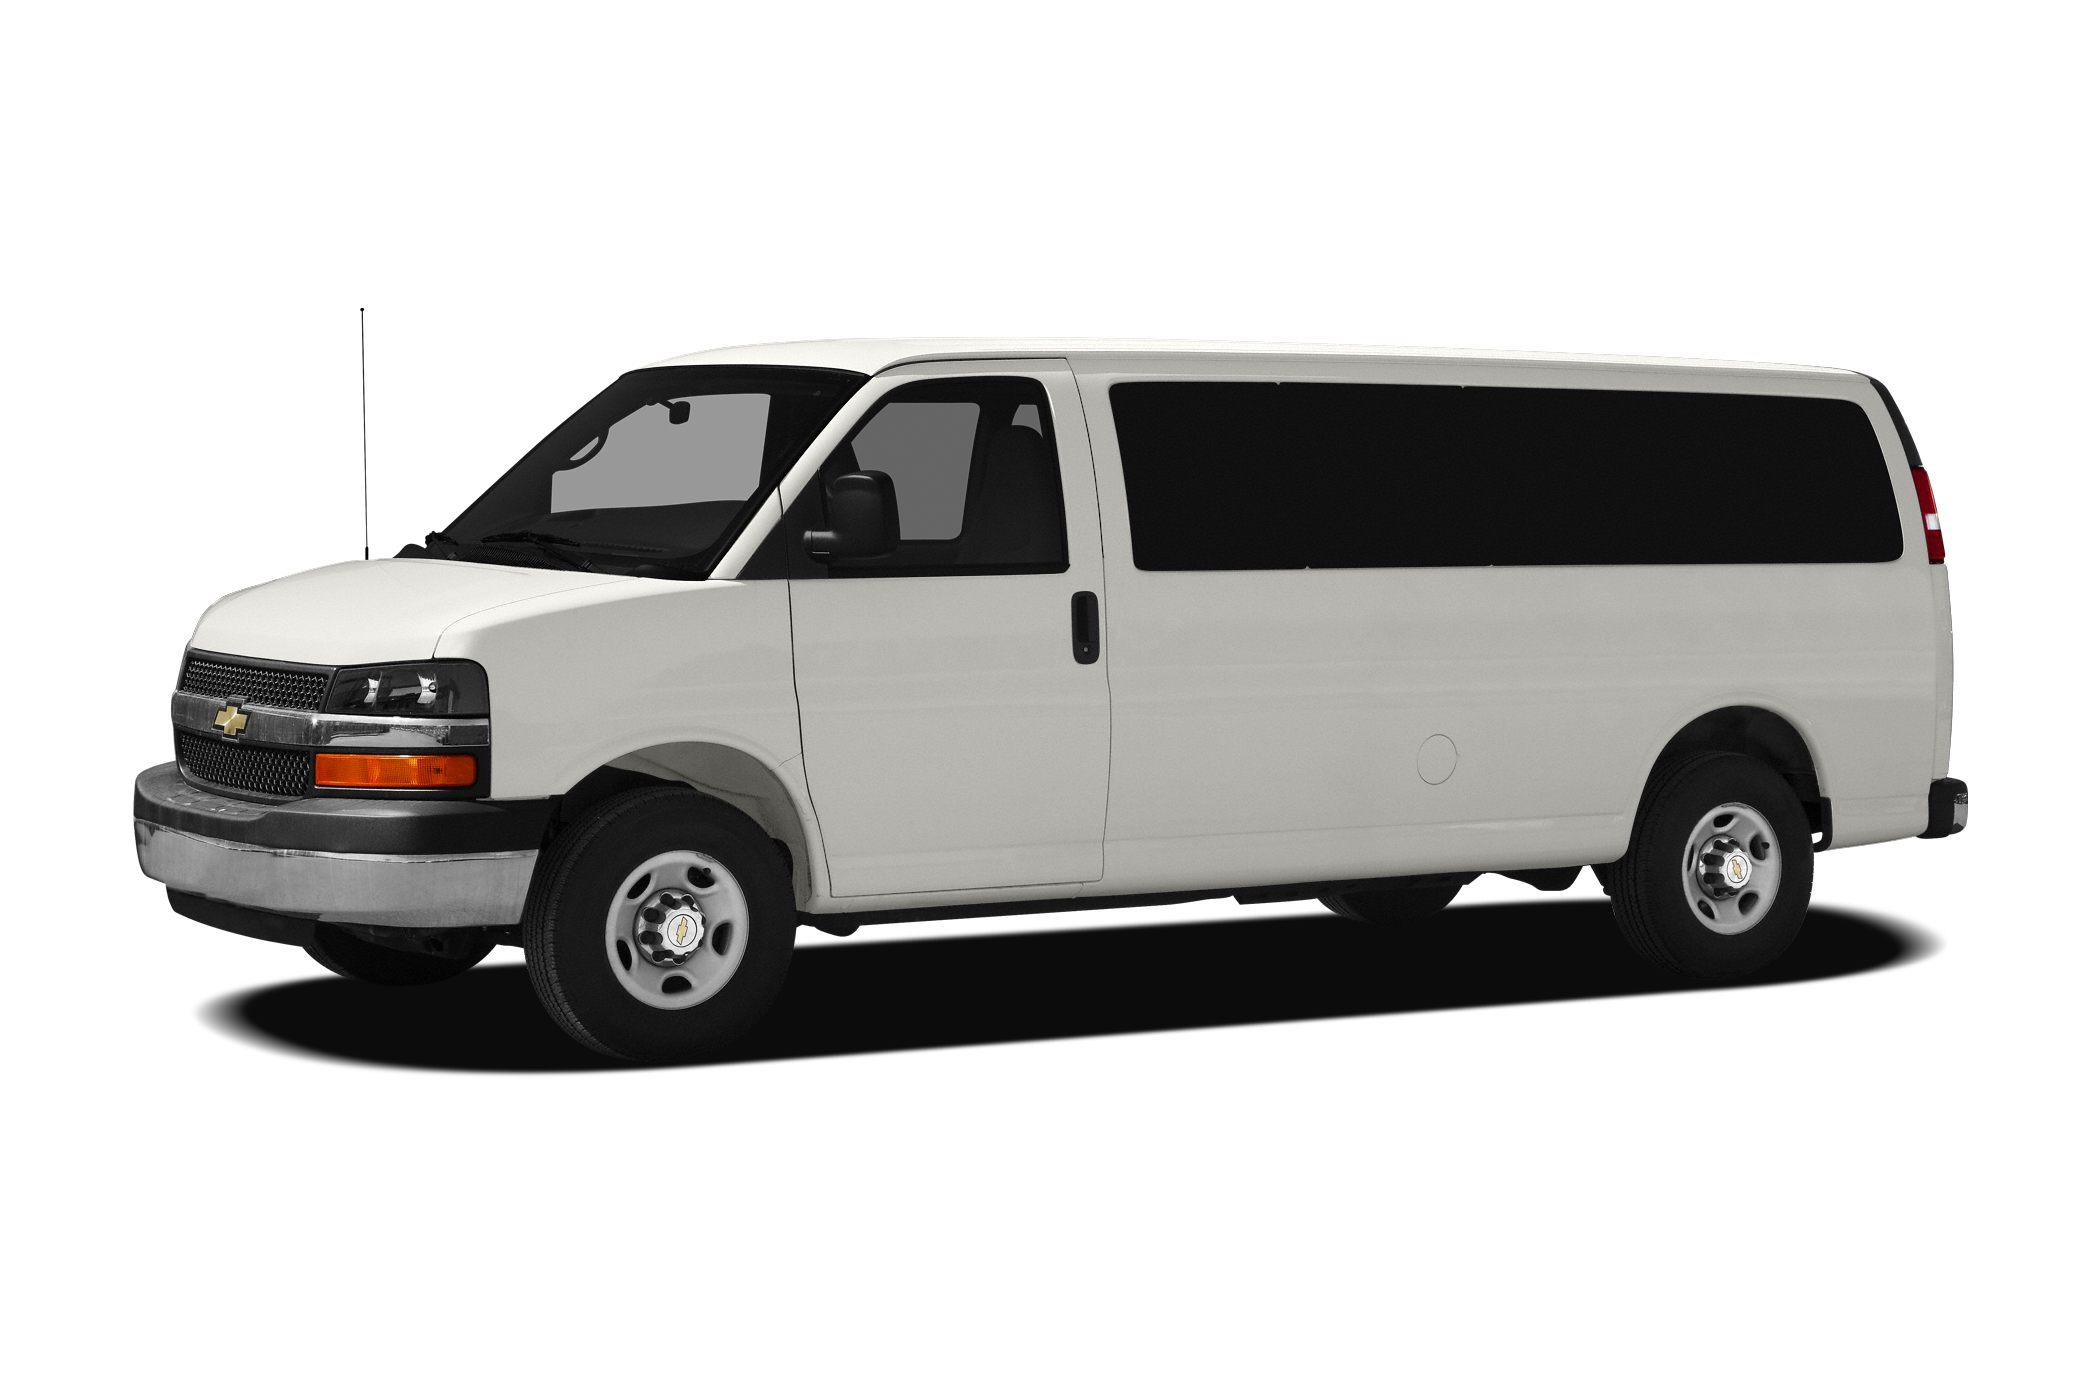 2011 Chevrolet Express 3500